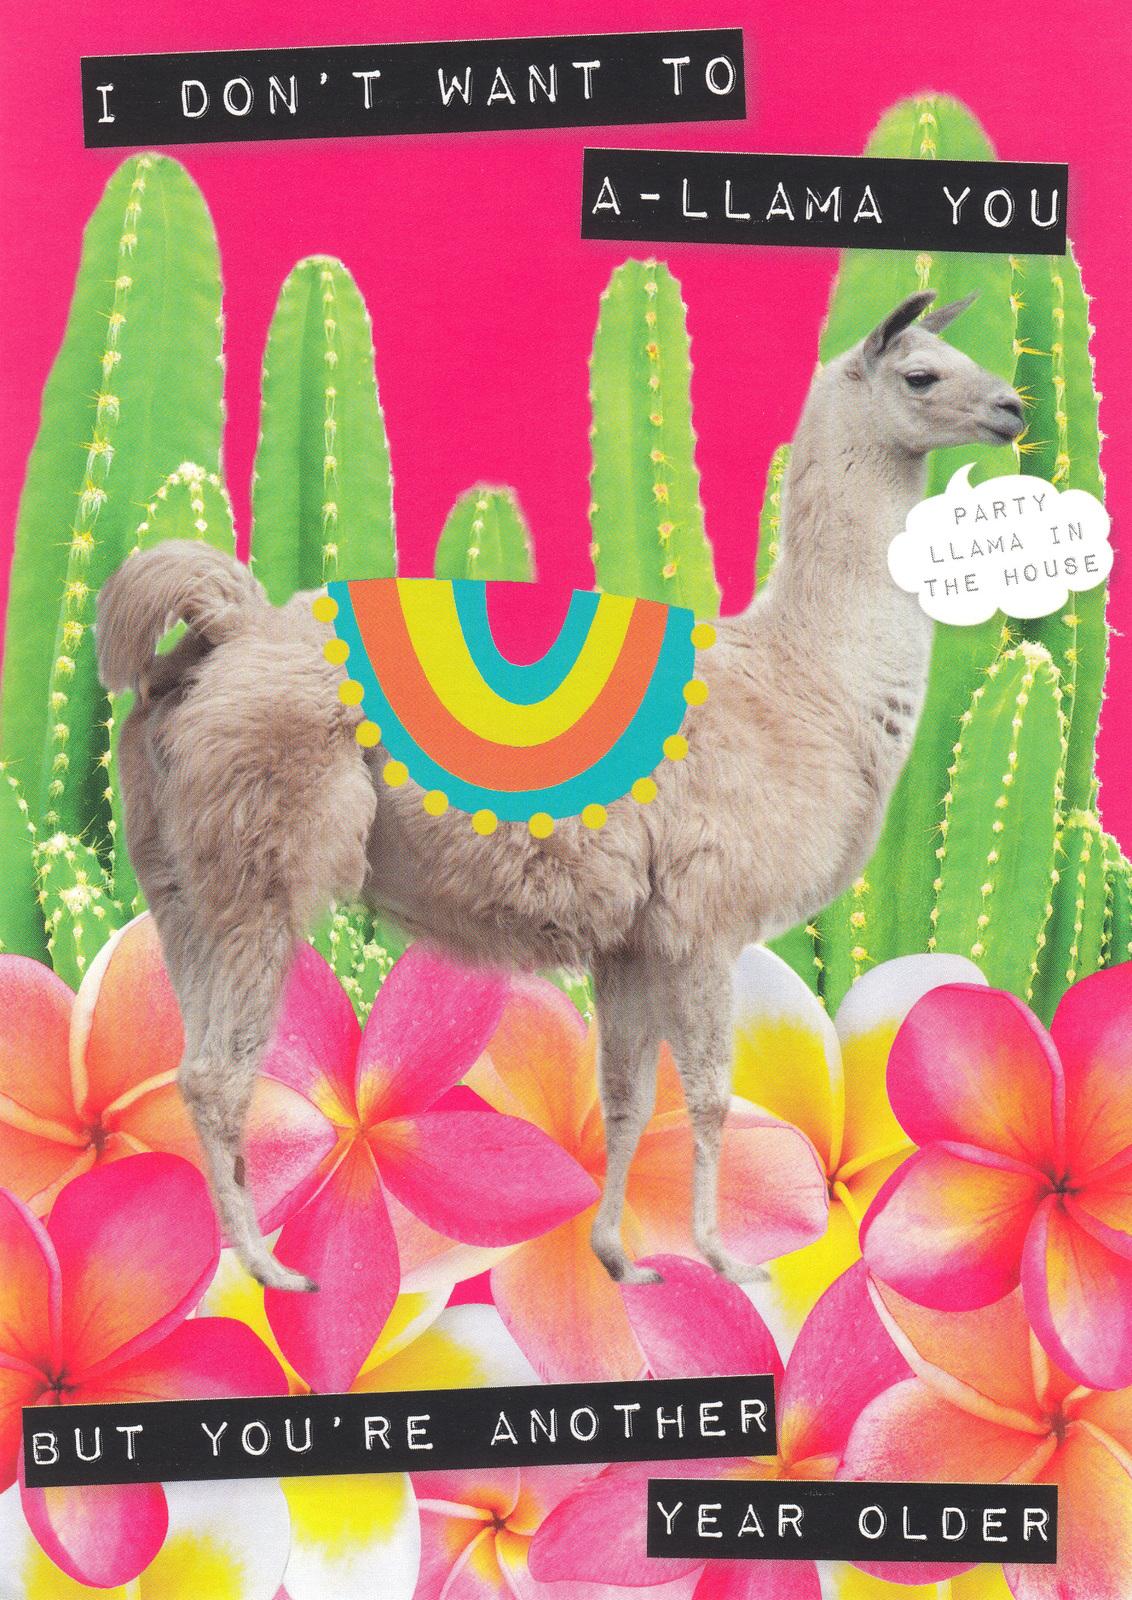 Ticker Tape Greeting Card - A-llama You image